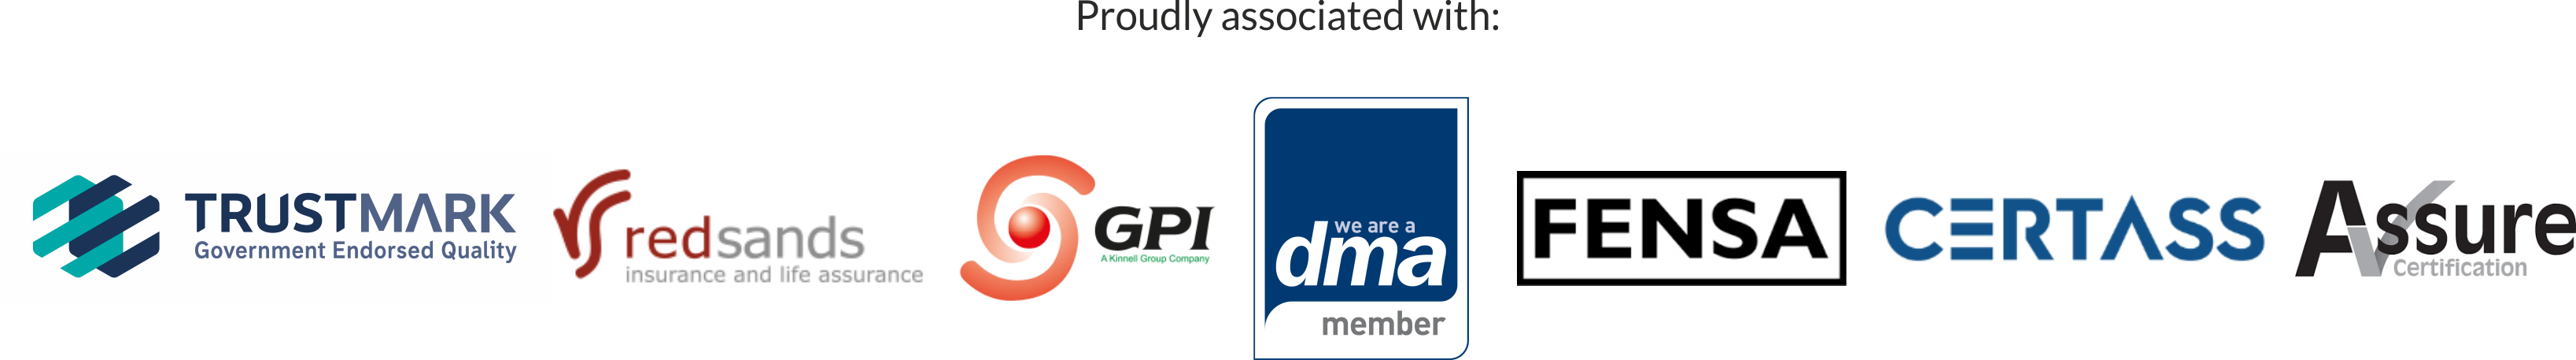 Association Logos with DMA